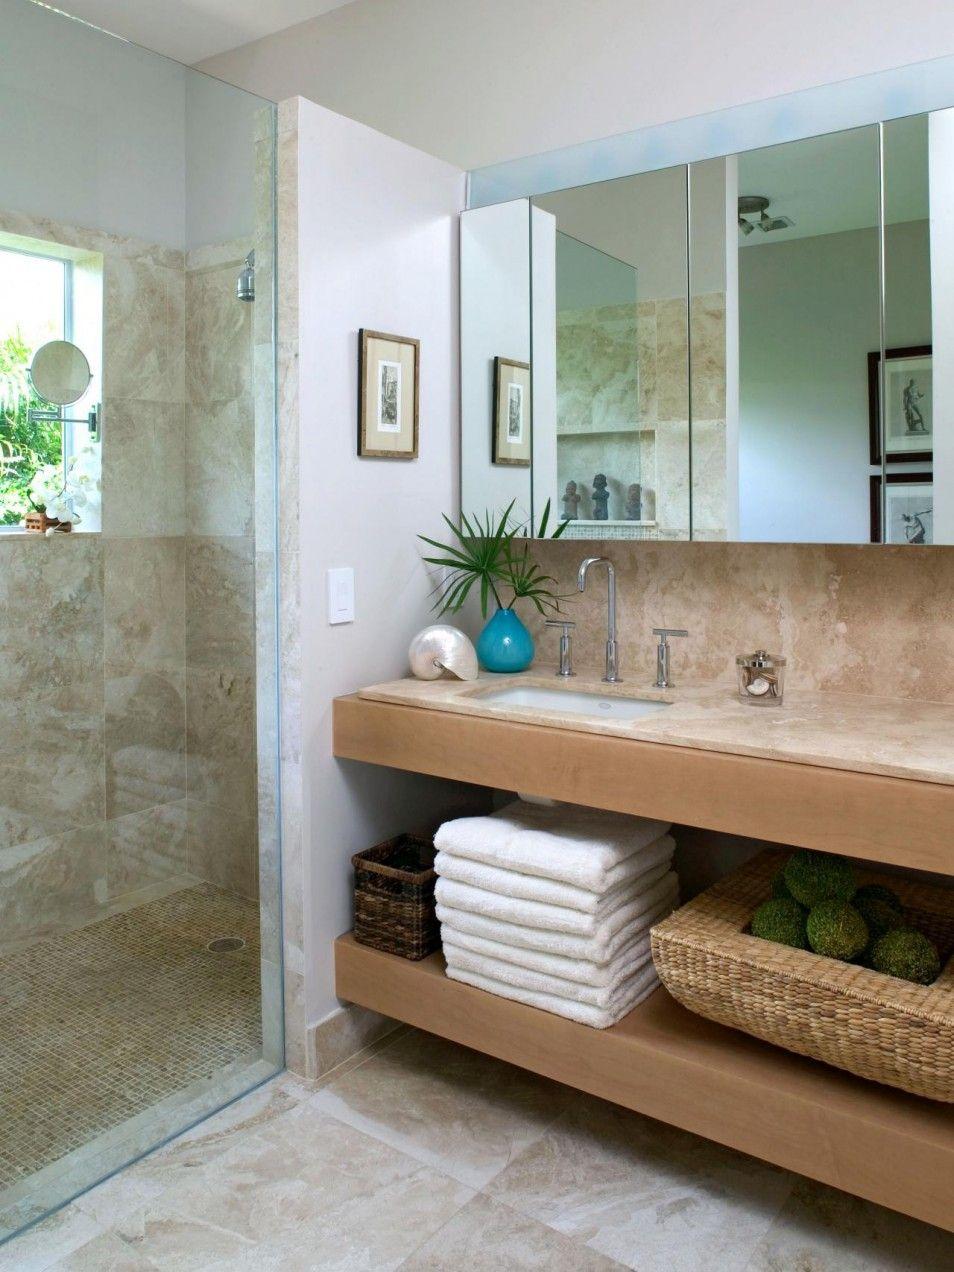 Relaxing Bathroom Colors: Beach Bathroom Colors For Relaxing And Enjoyable Feelings